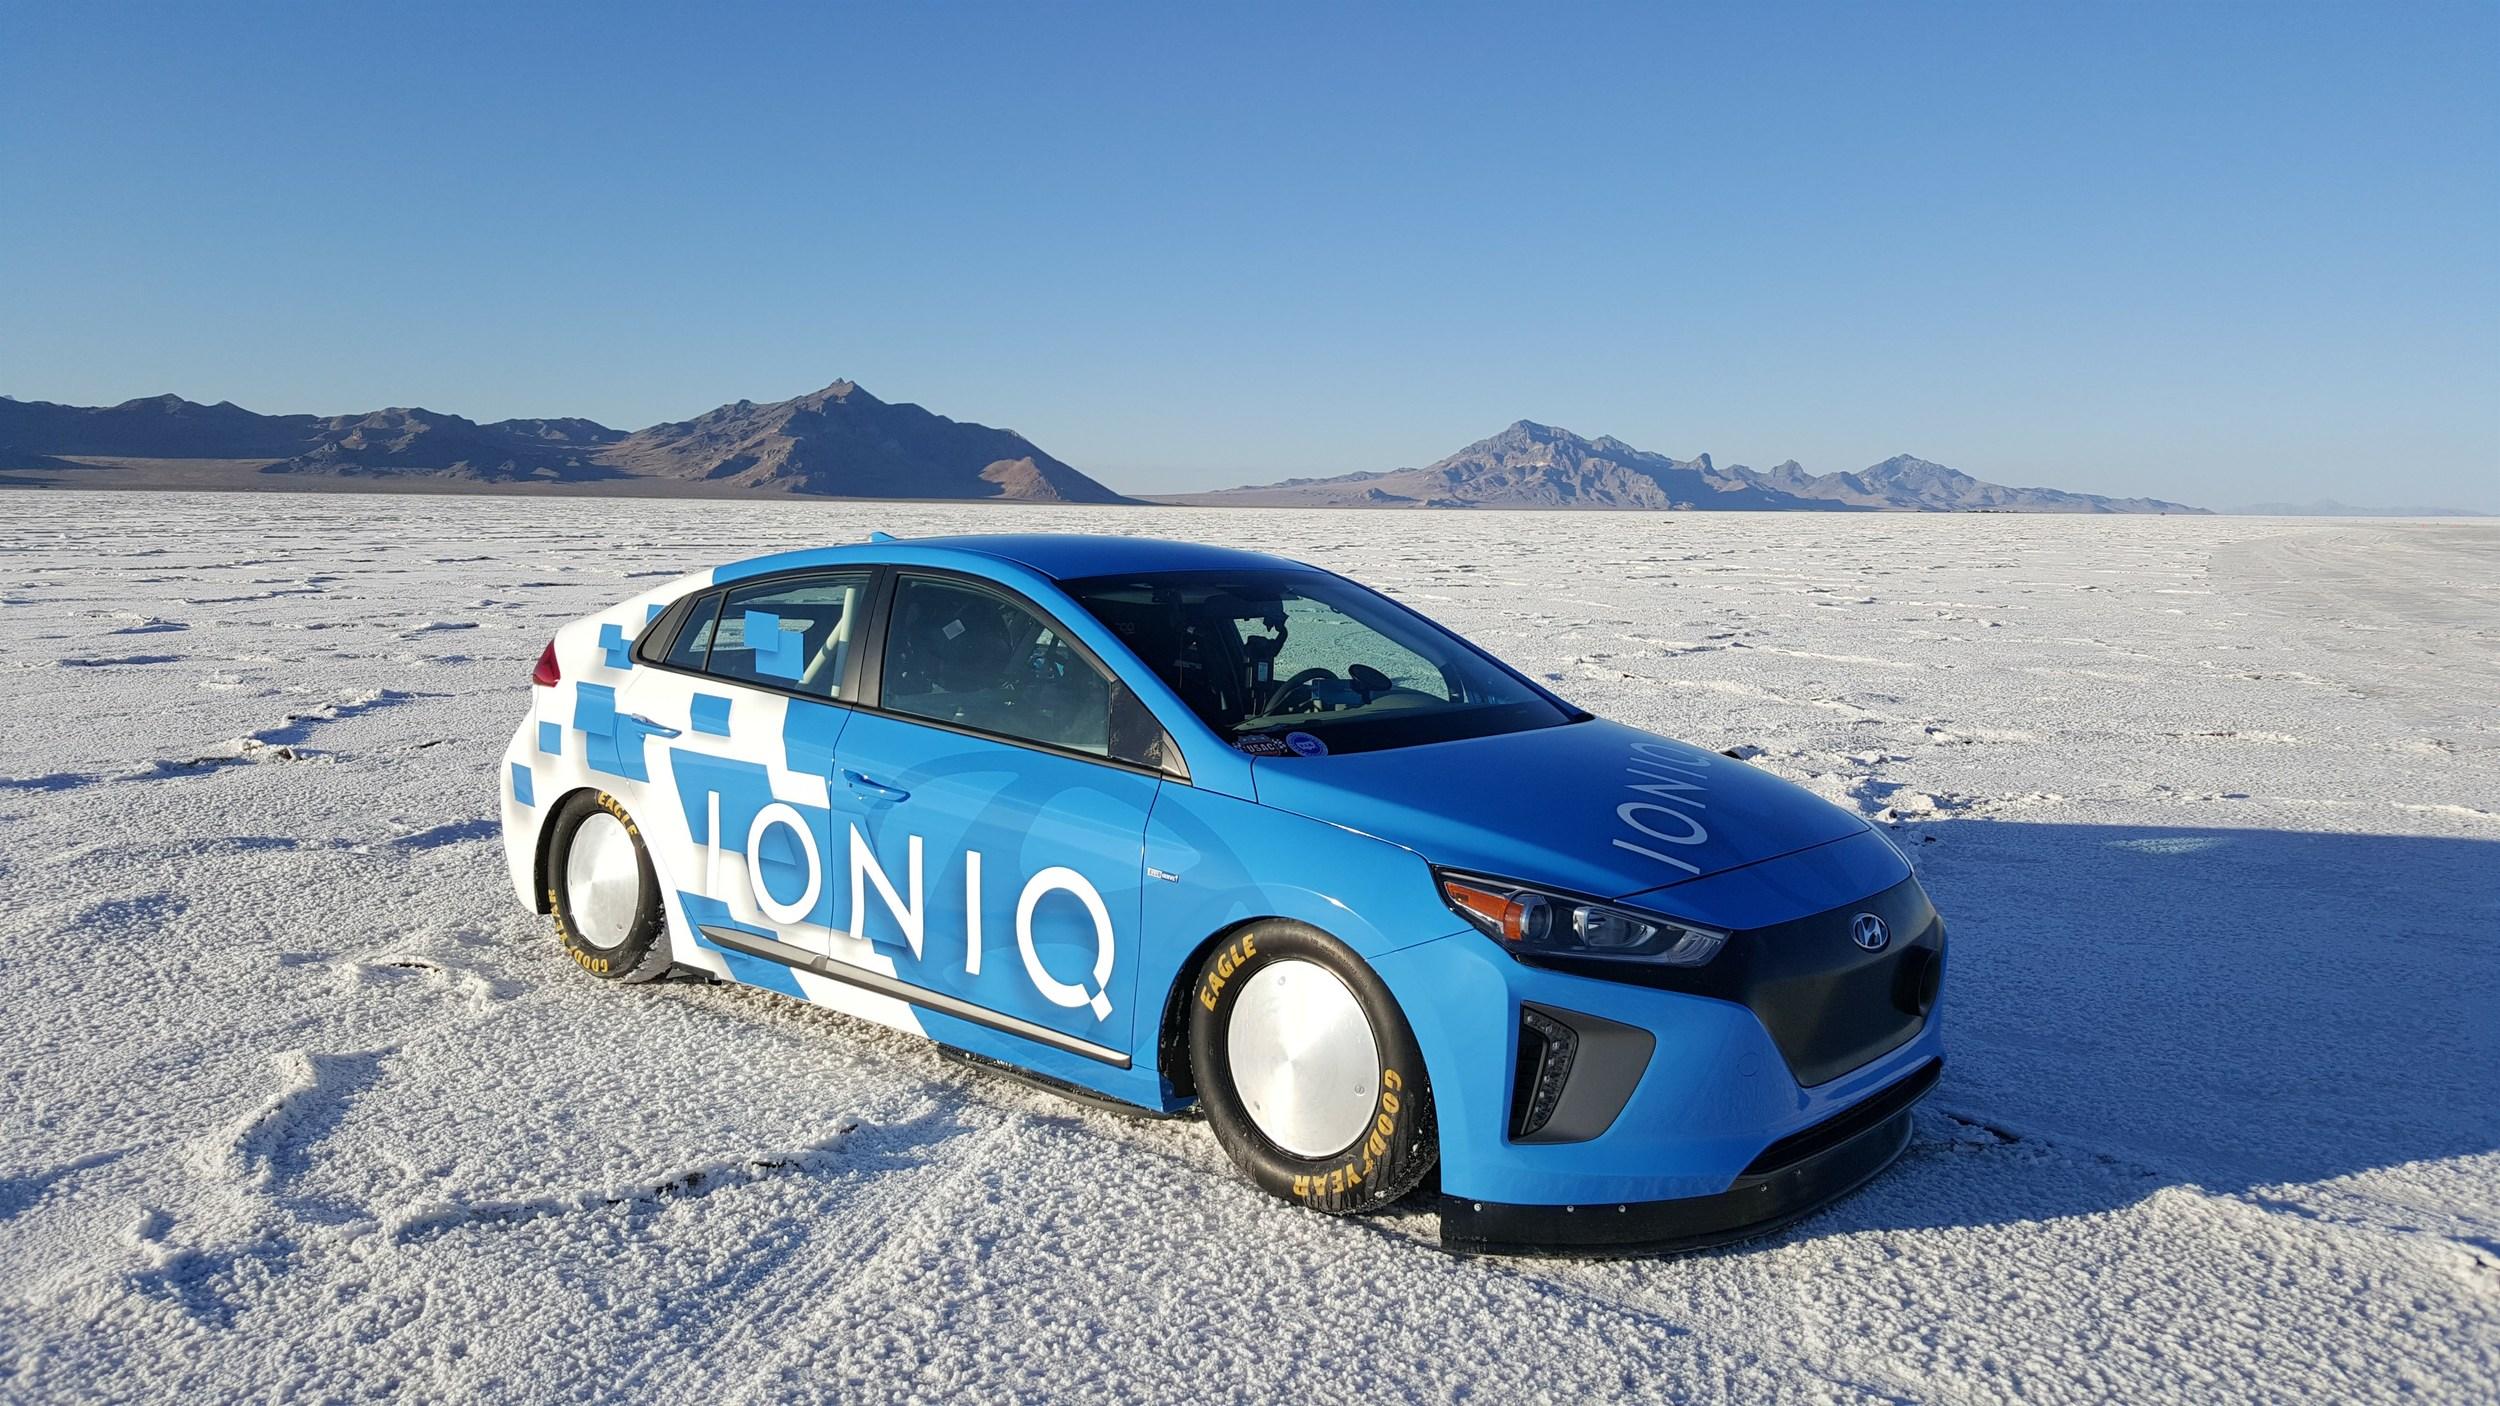 46444-ioniq-land-speed-record-car-1